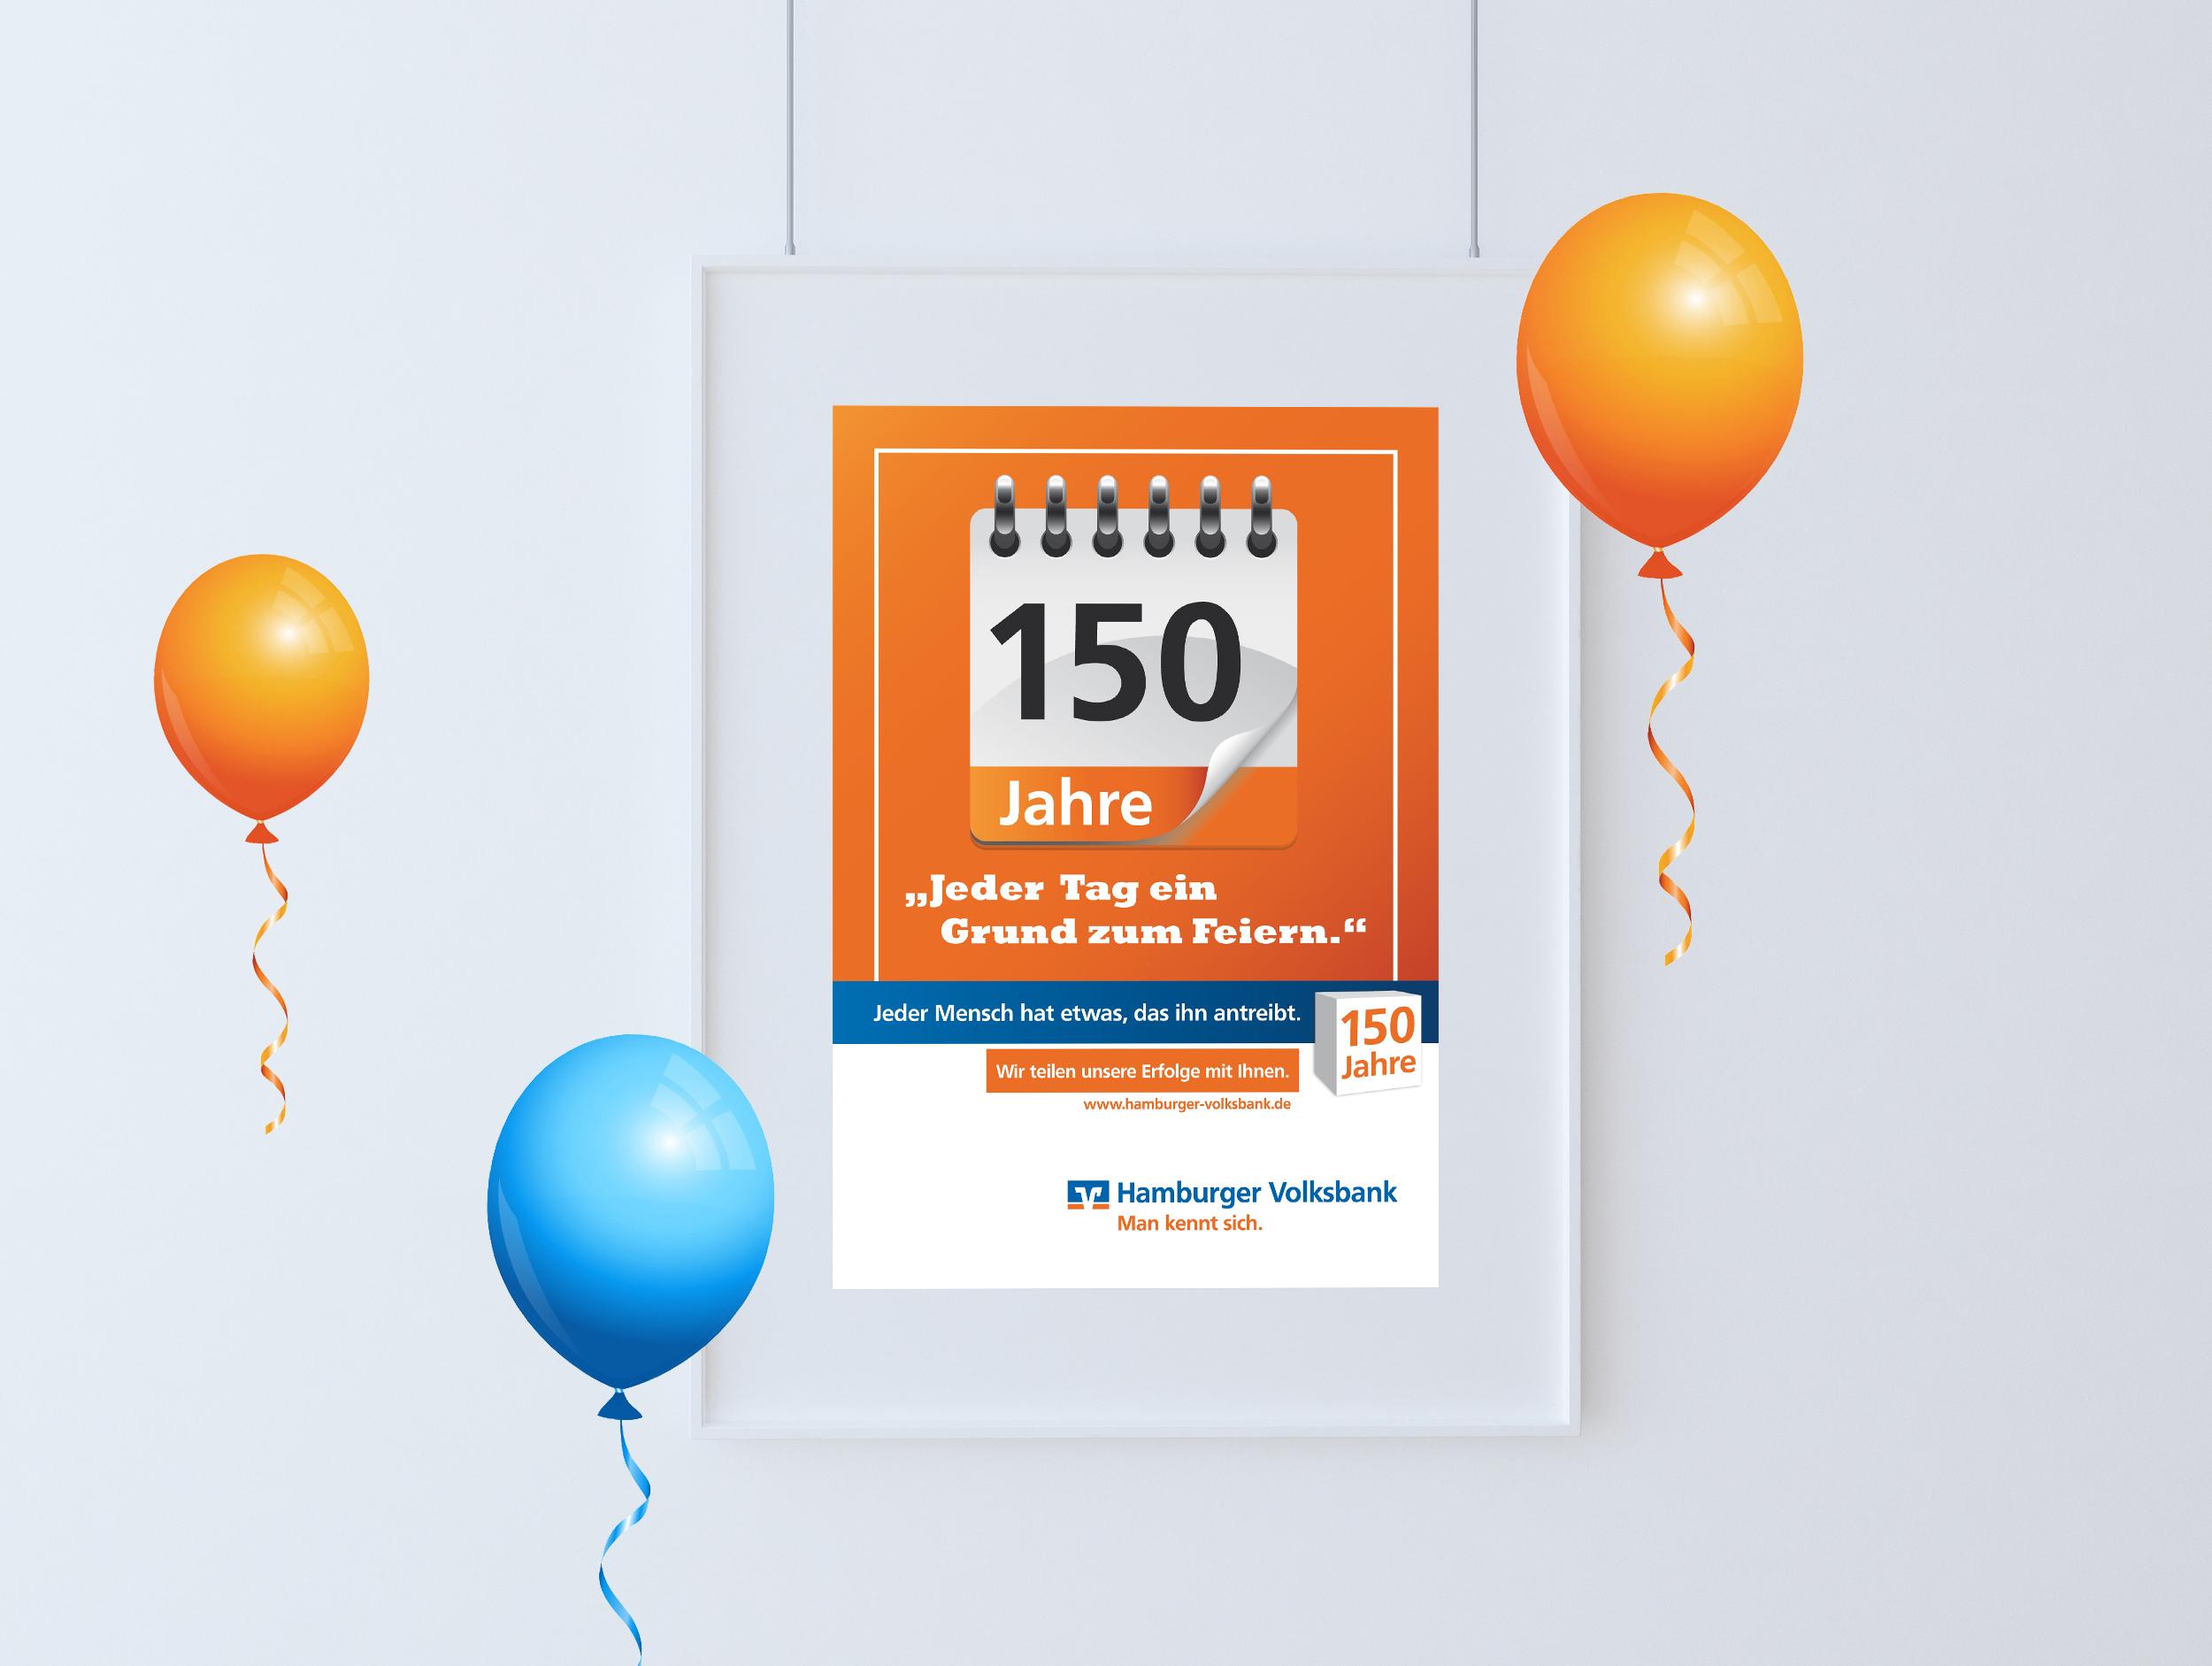 Hamburger Volksbank Jubiläum Plakat